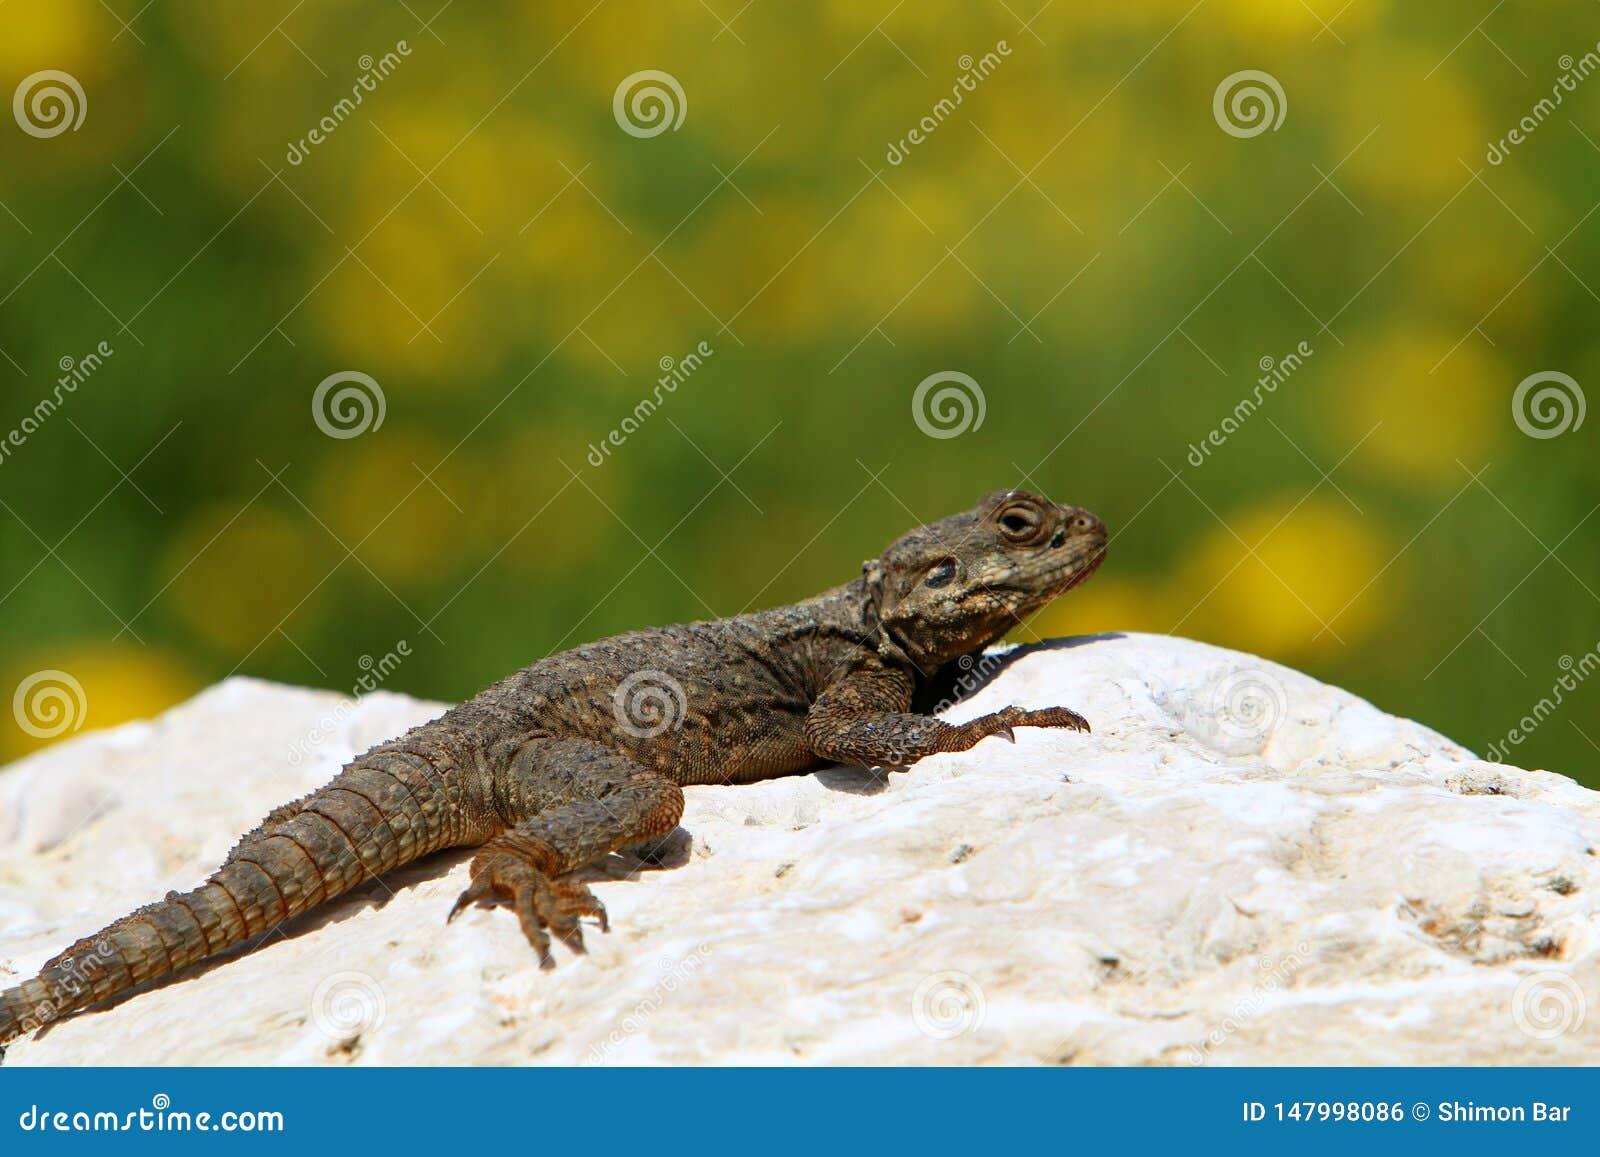 The lizard sits on a big rock